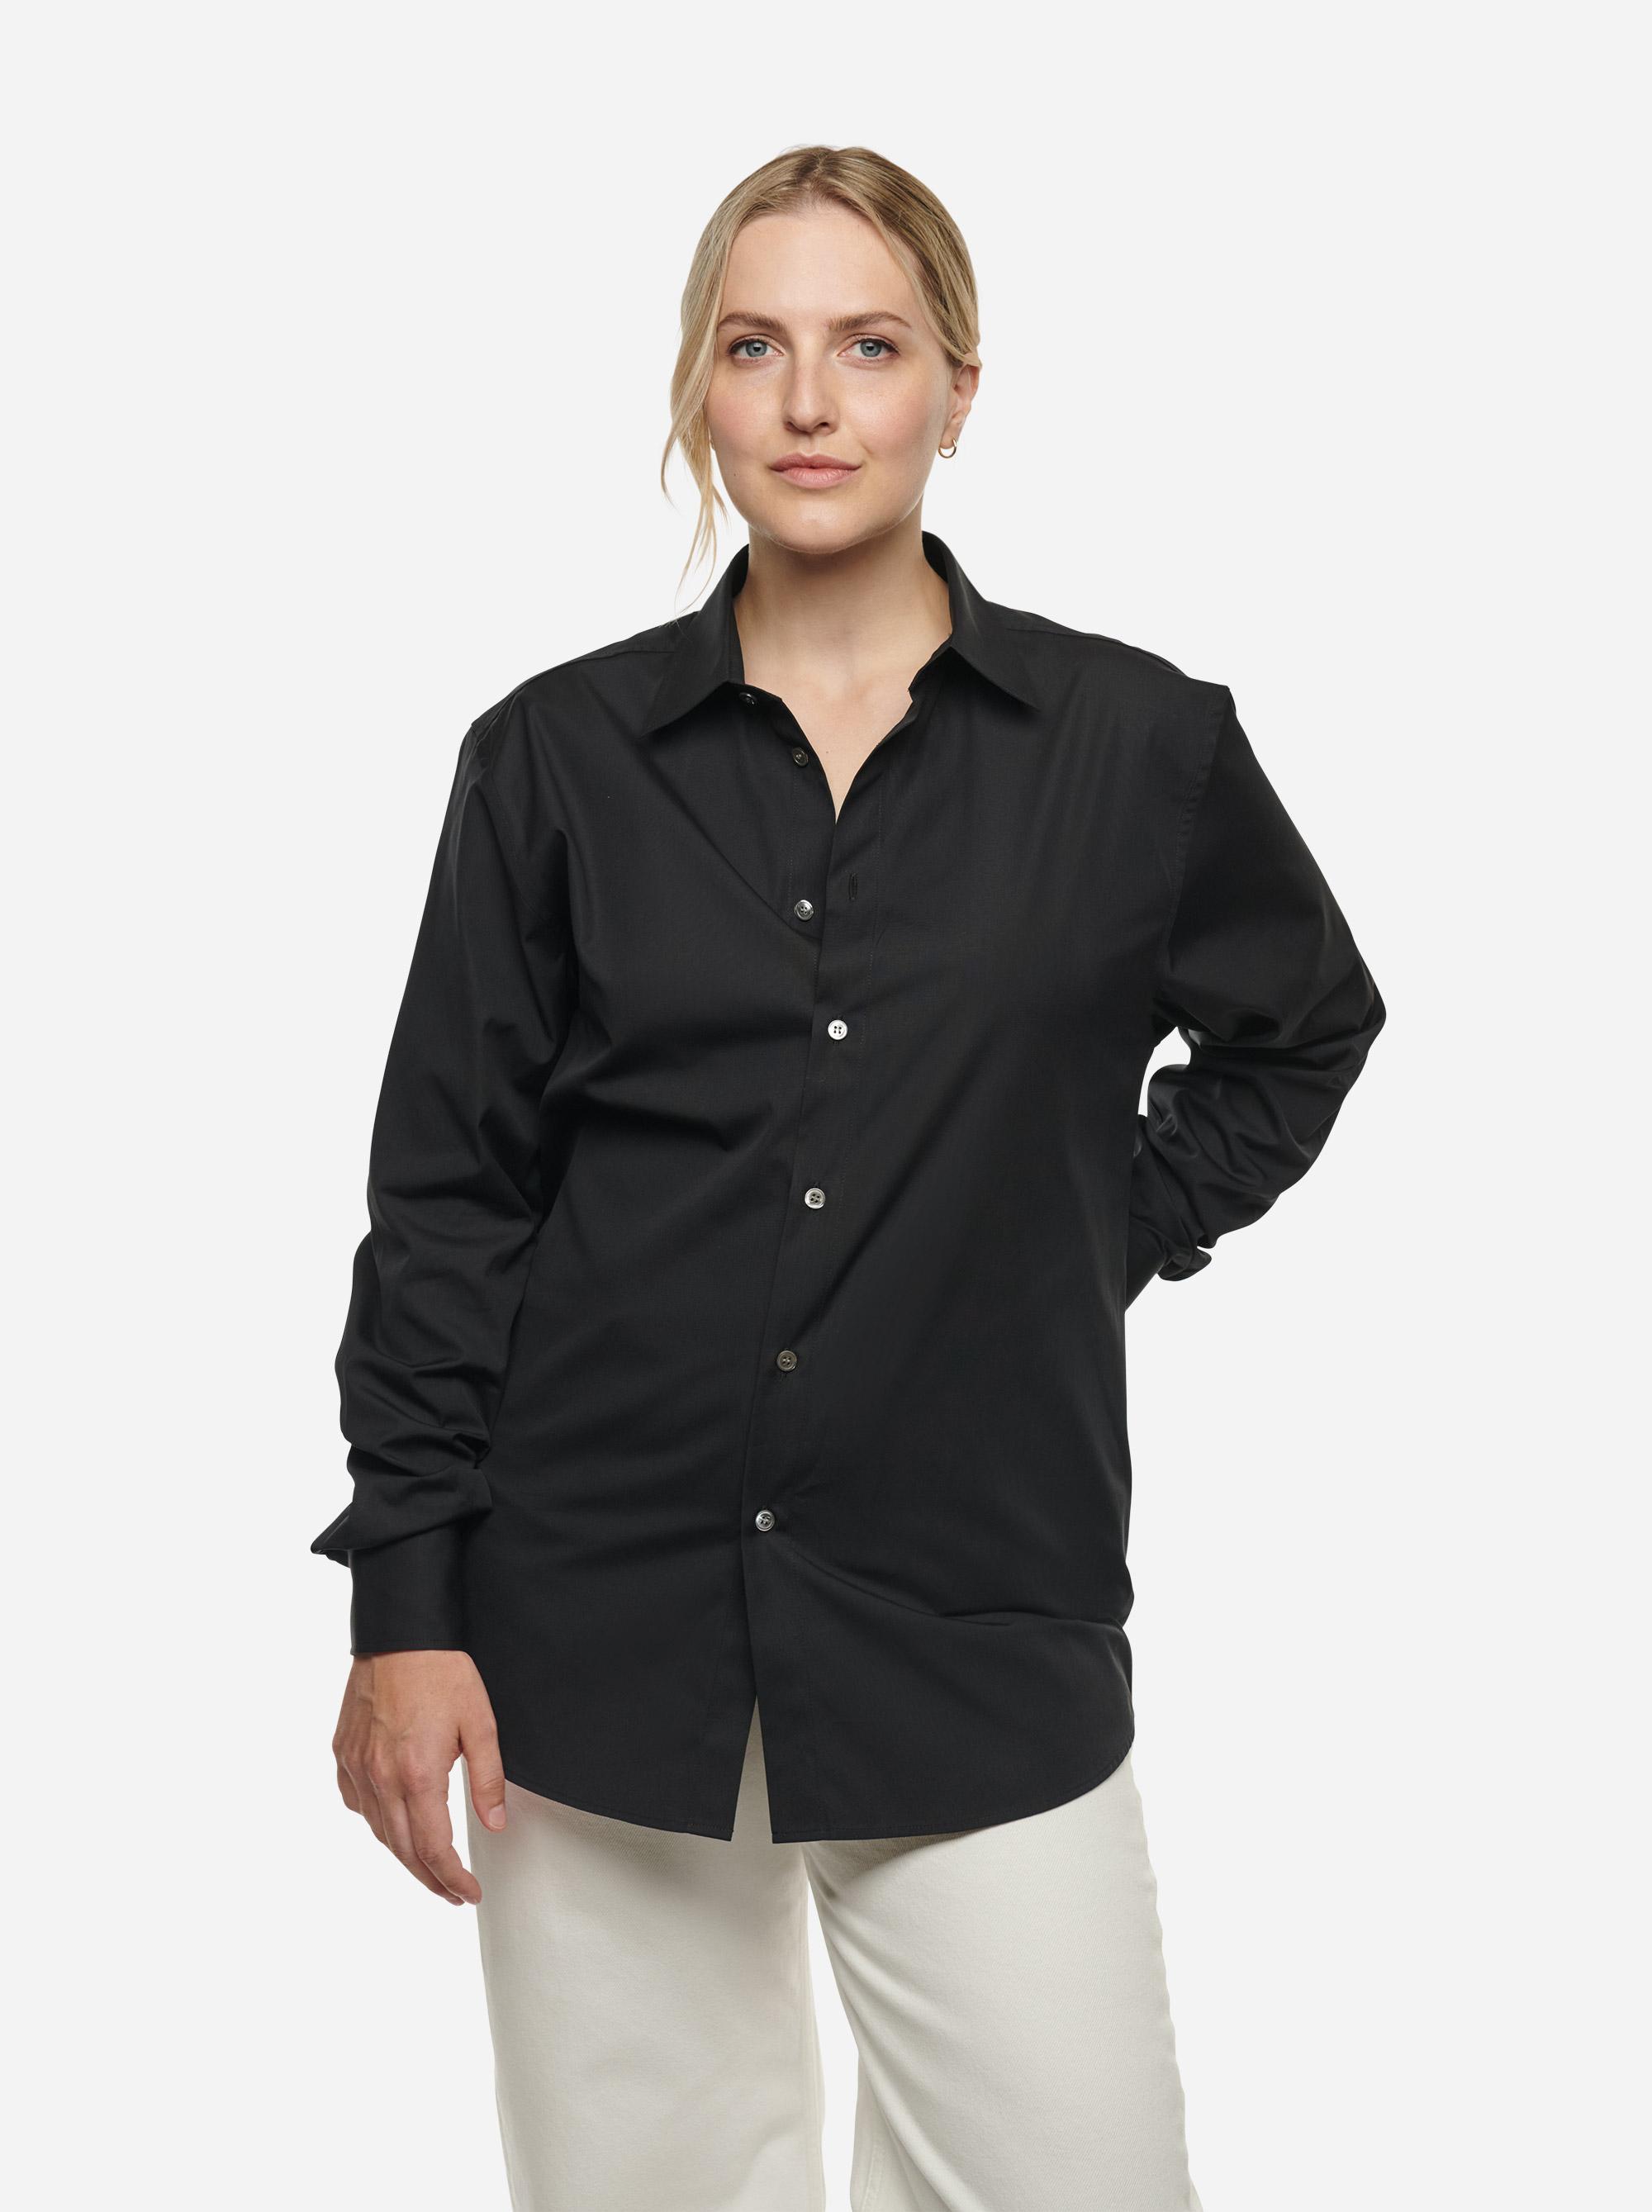 Teym-Shirt-Black-women-2